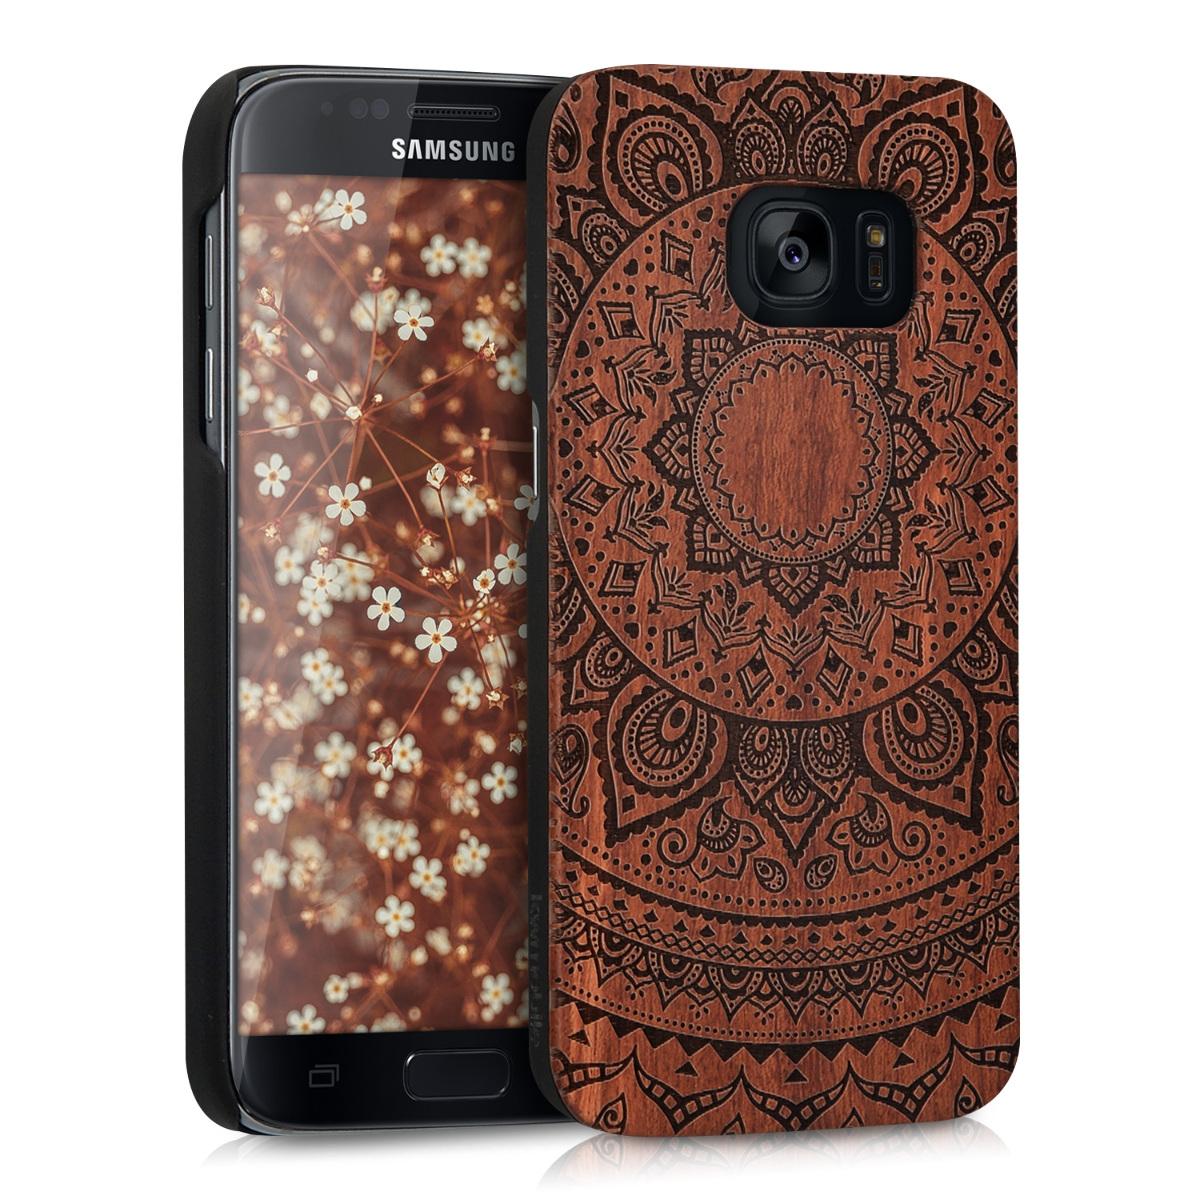 KW Ξύλινη Θήκη Samsung Galaxy S7 - Brown - Mandala (39561.01)